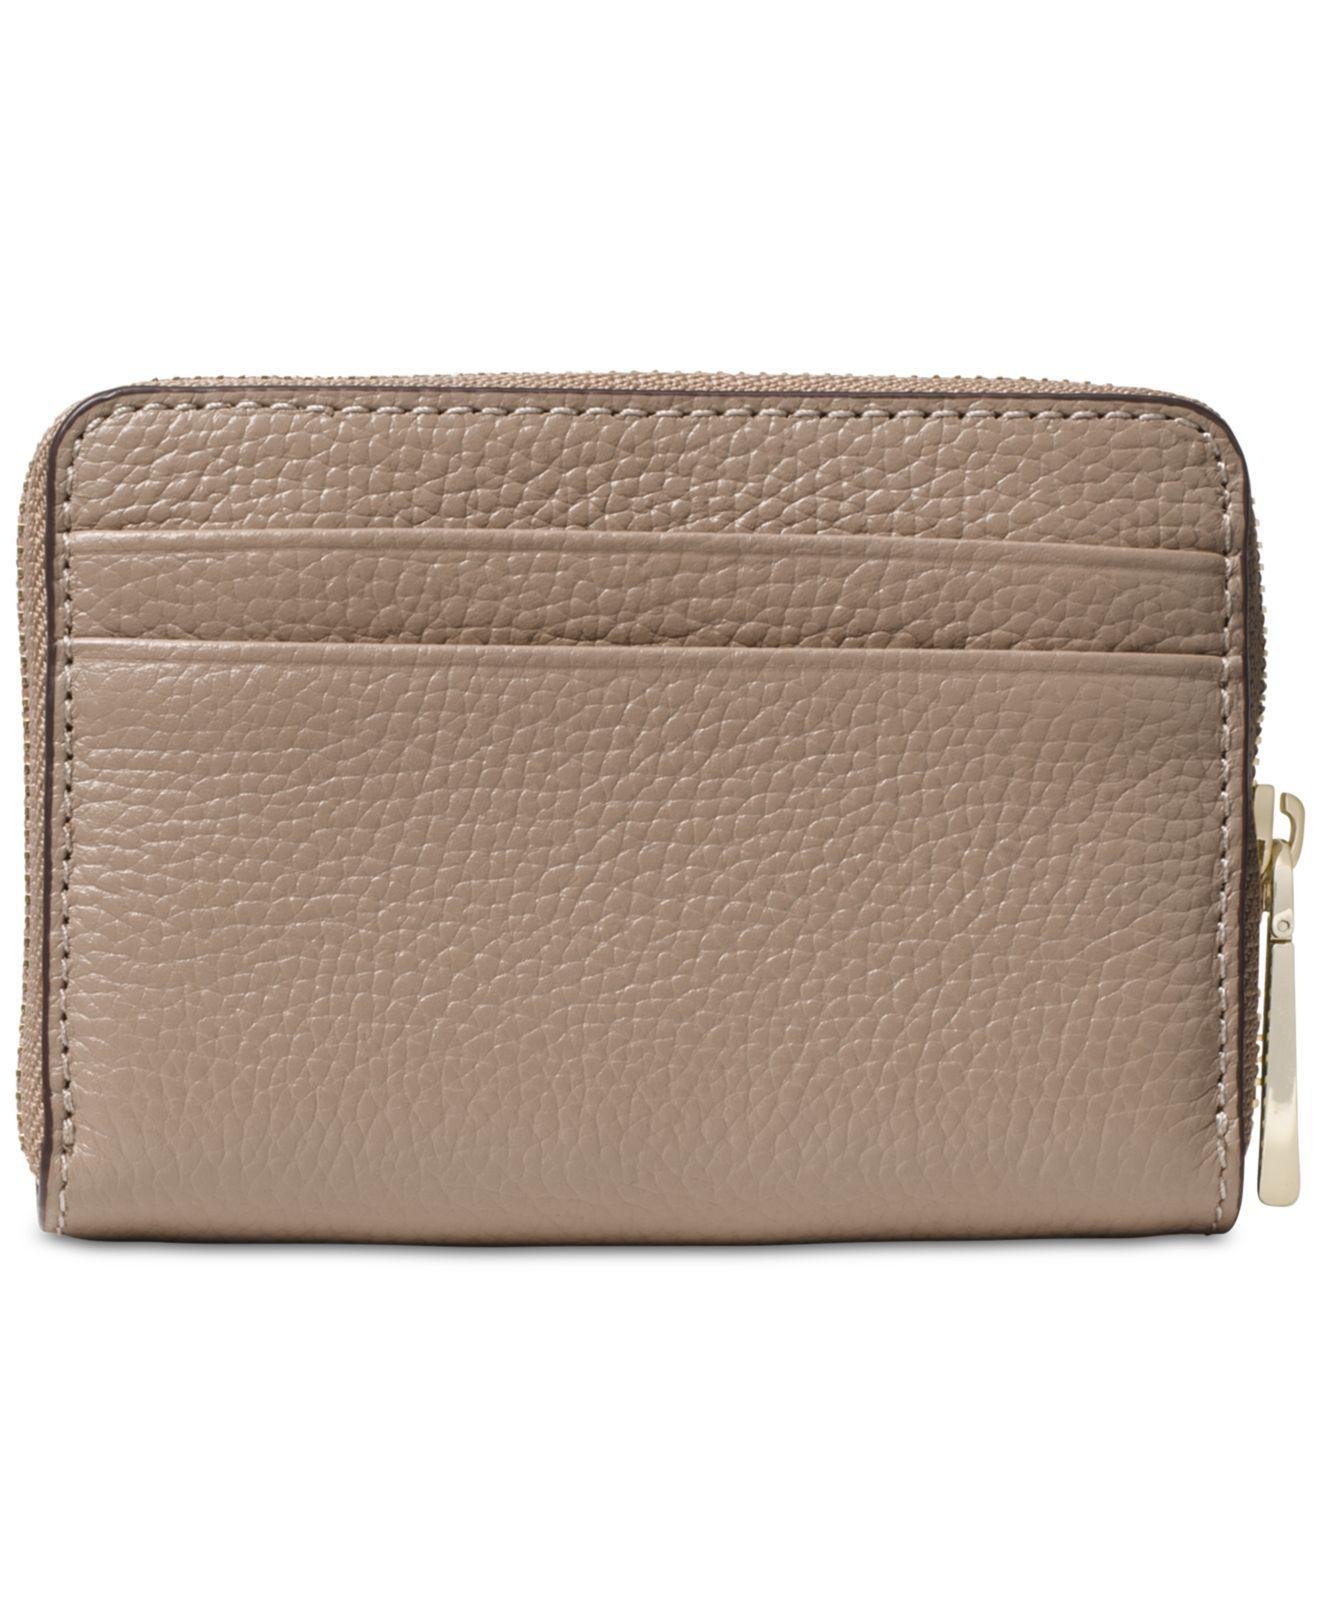 62c20d9401c28d Michael Kors Michael Pebble Leather Zip-around Coin & Card Case - Lyst